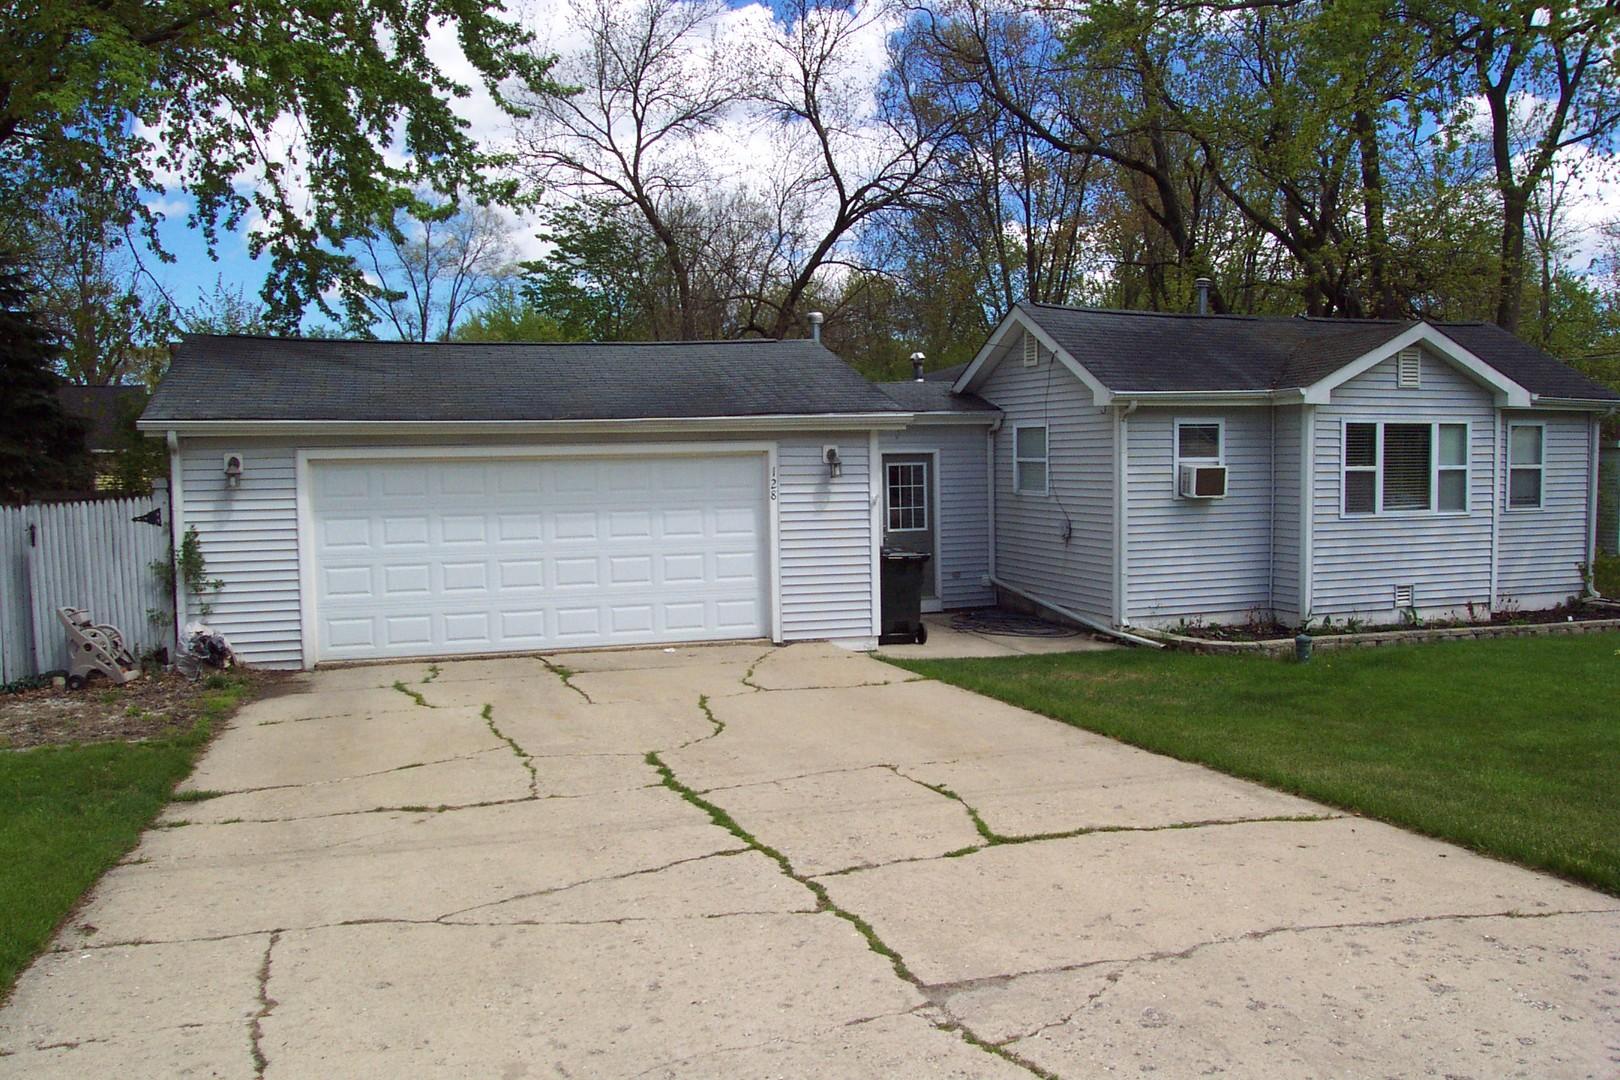 128 S Sheridan Road, Lakemoor IL 60051